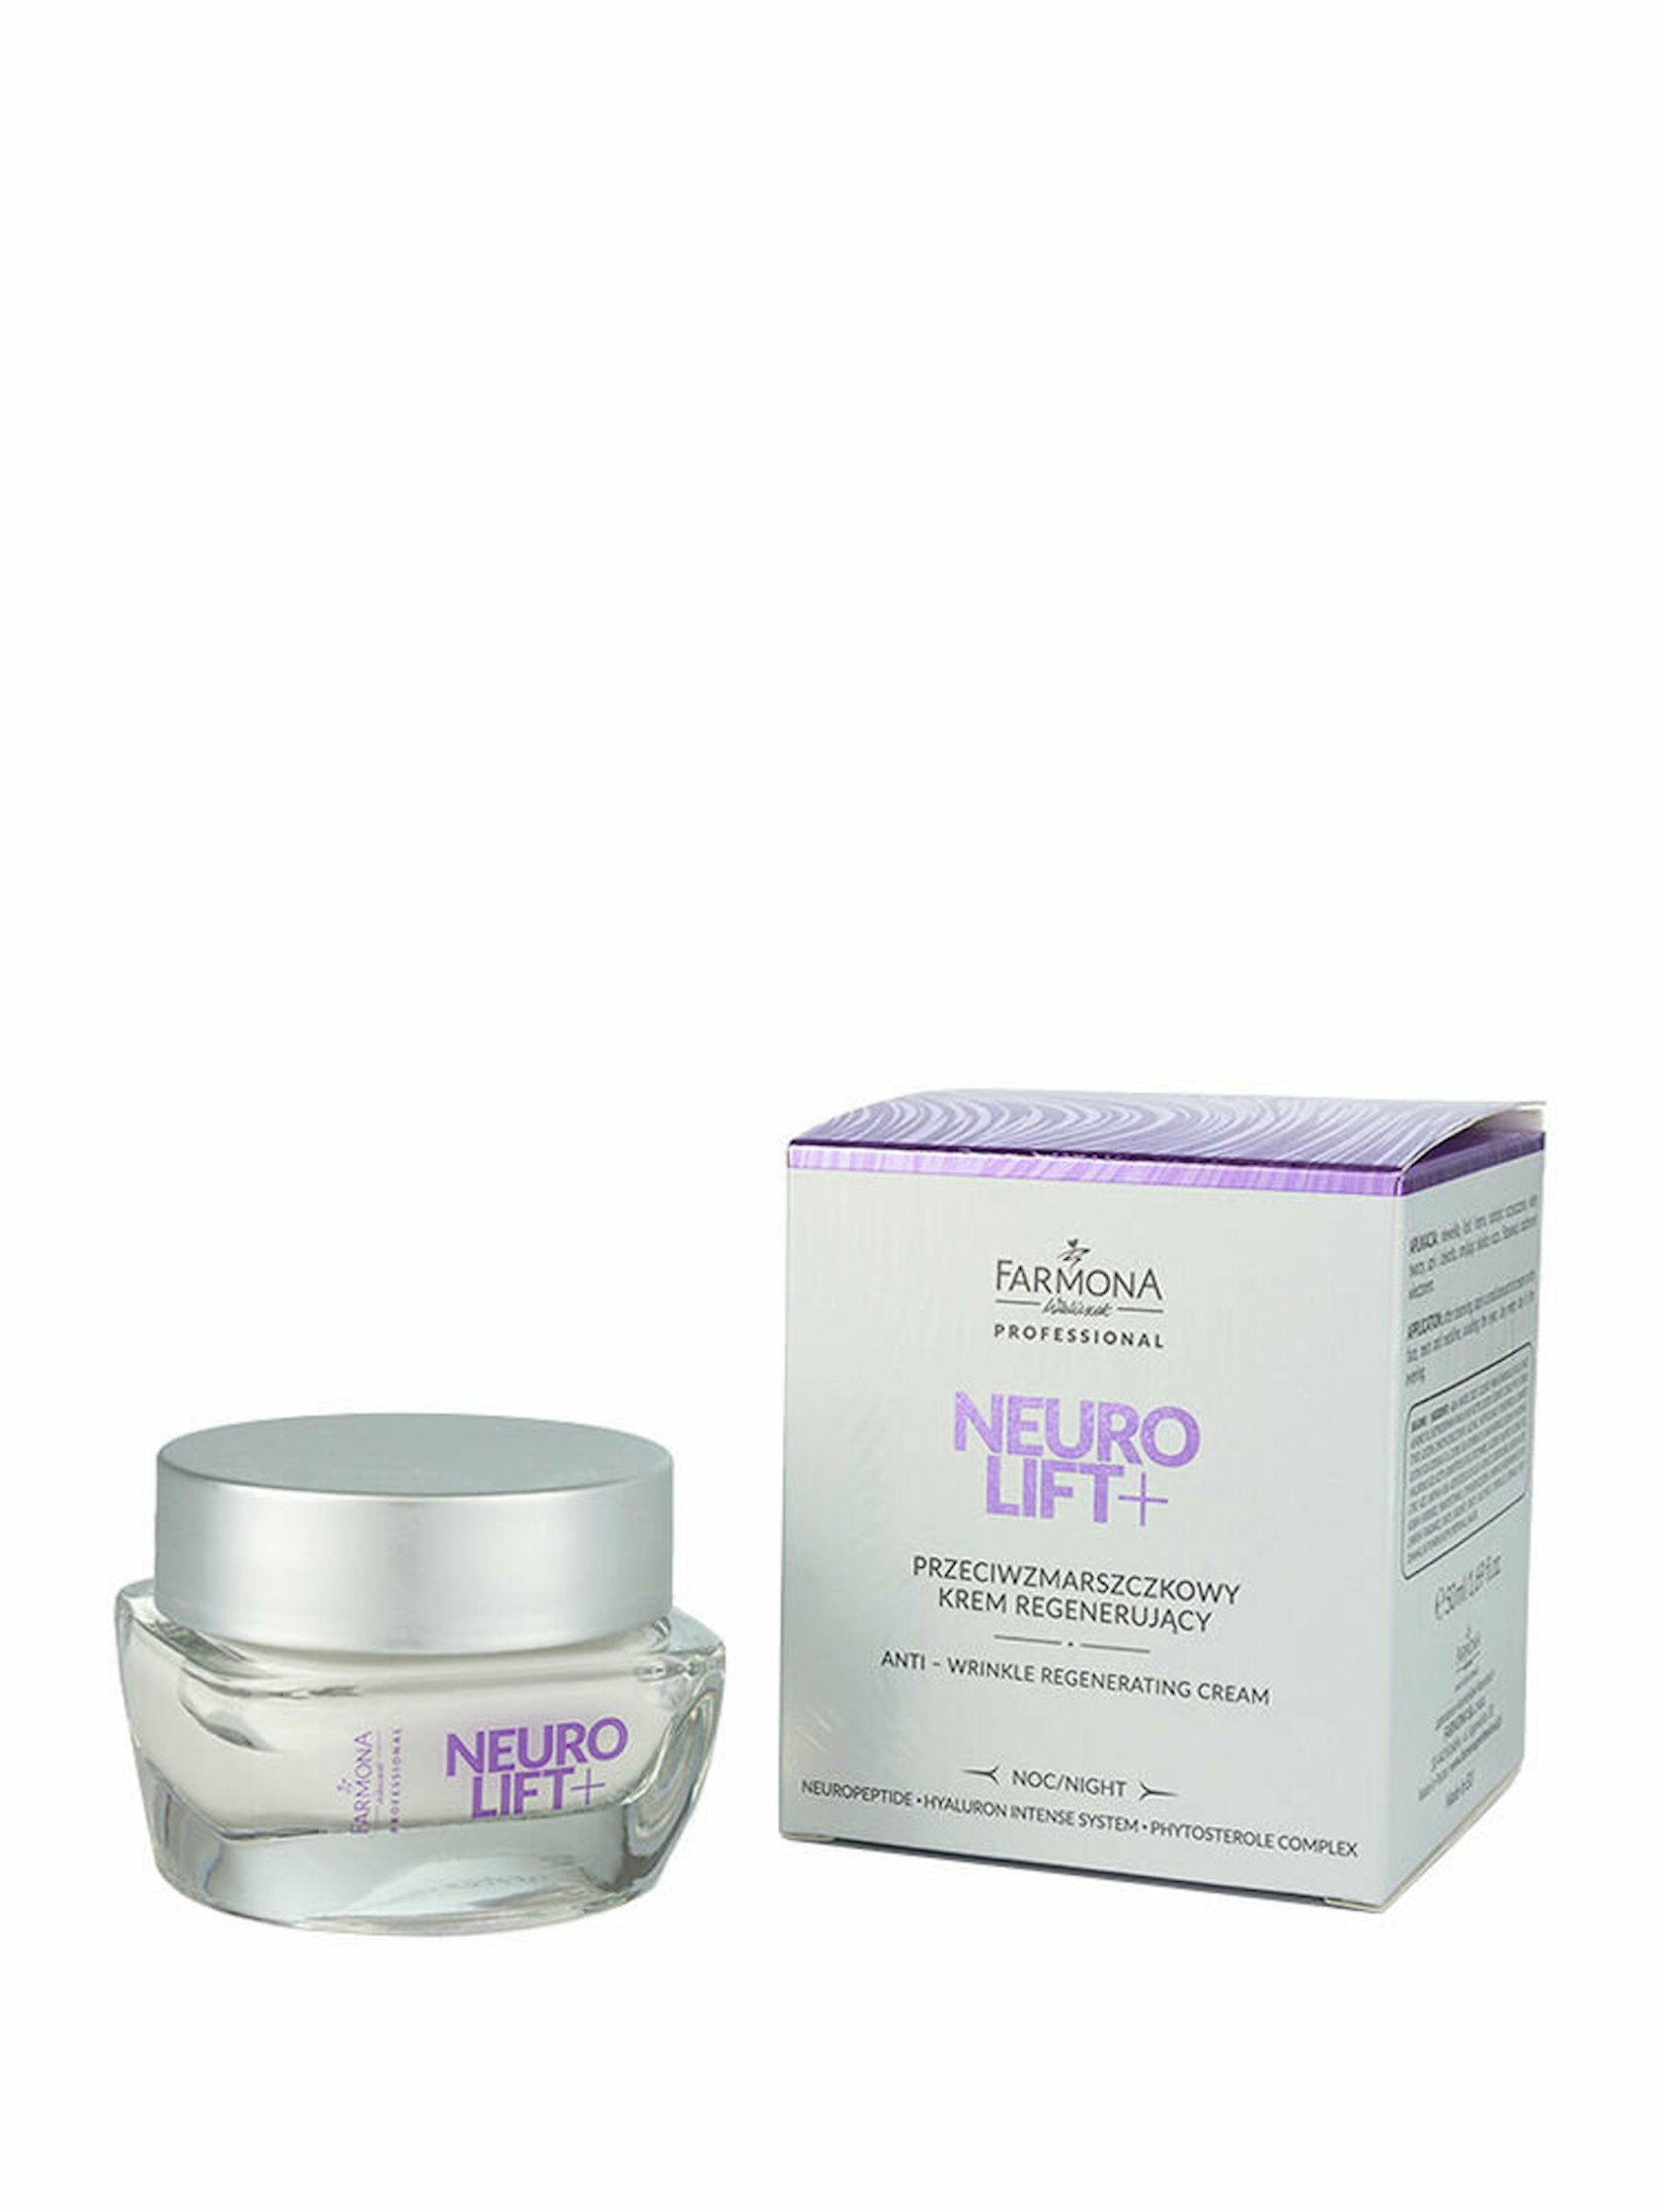 Hamarlayıcı gecə kremi Farmona Neuro Lift+ Anti-Wrinkle Regenerating Night Cream 50 ml